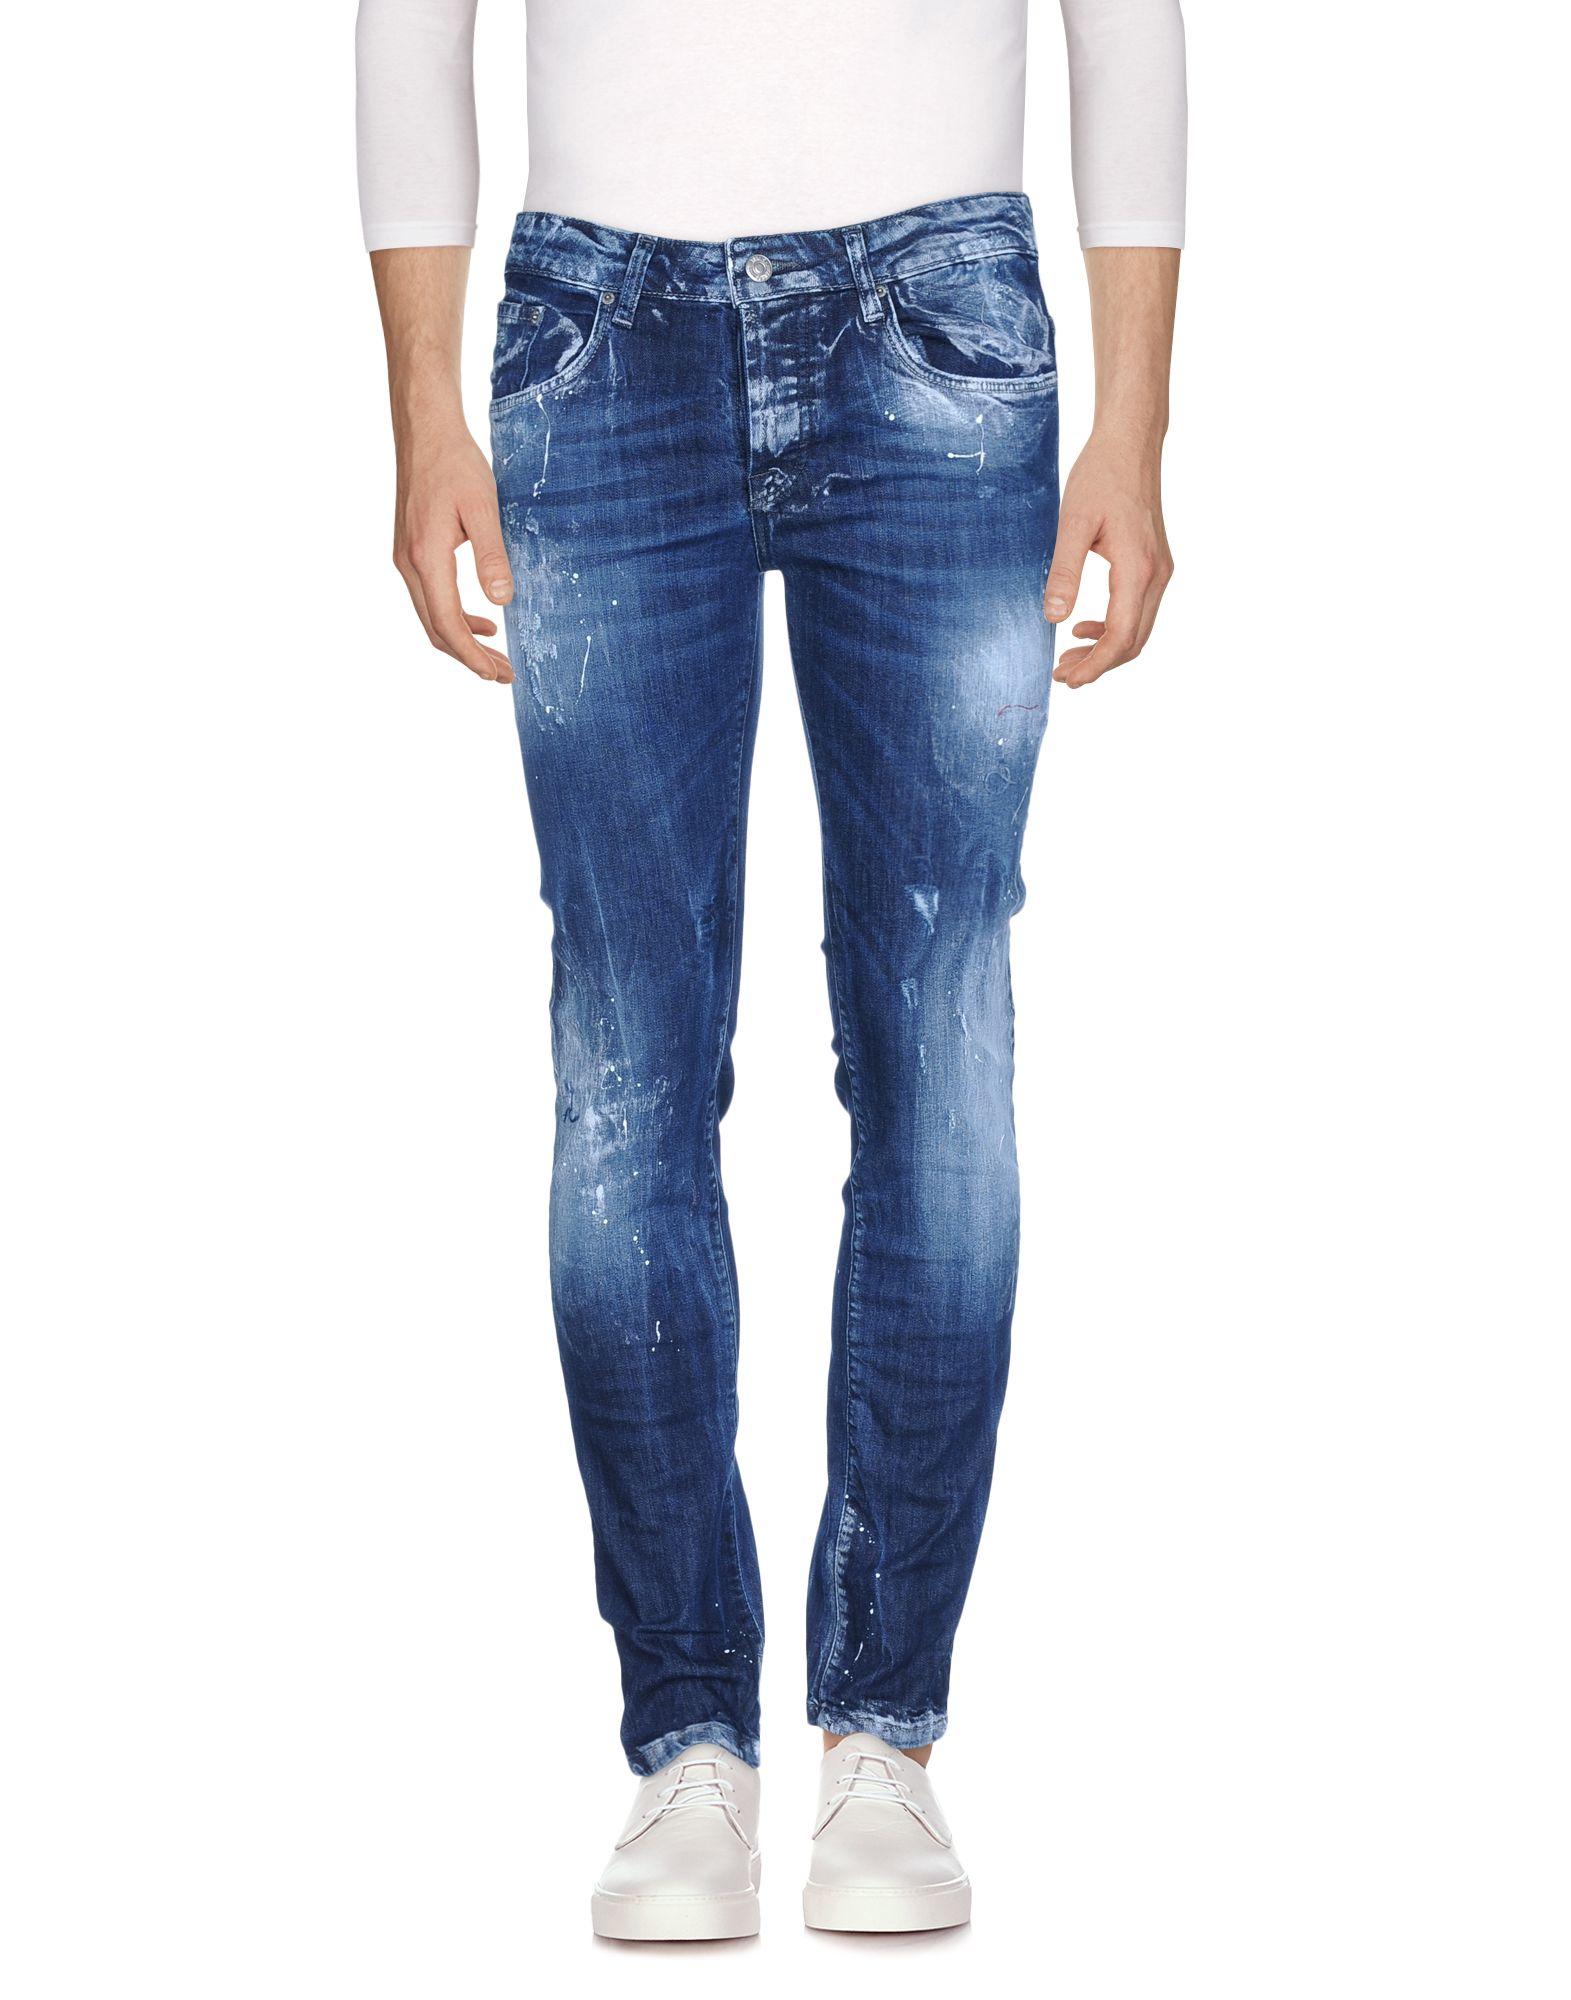 Pantaloni Jeans Takeshy Kurosawa Uomo - Acquista online su